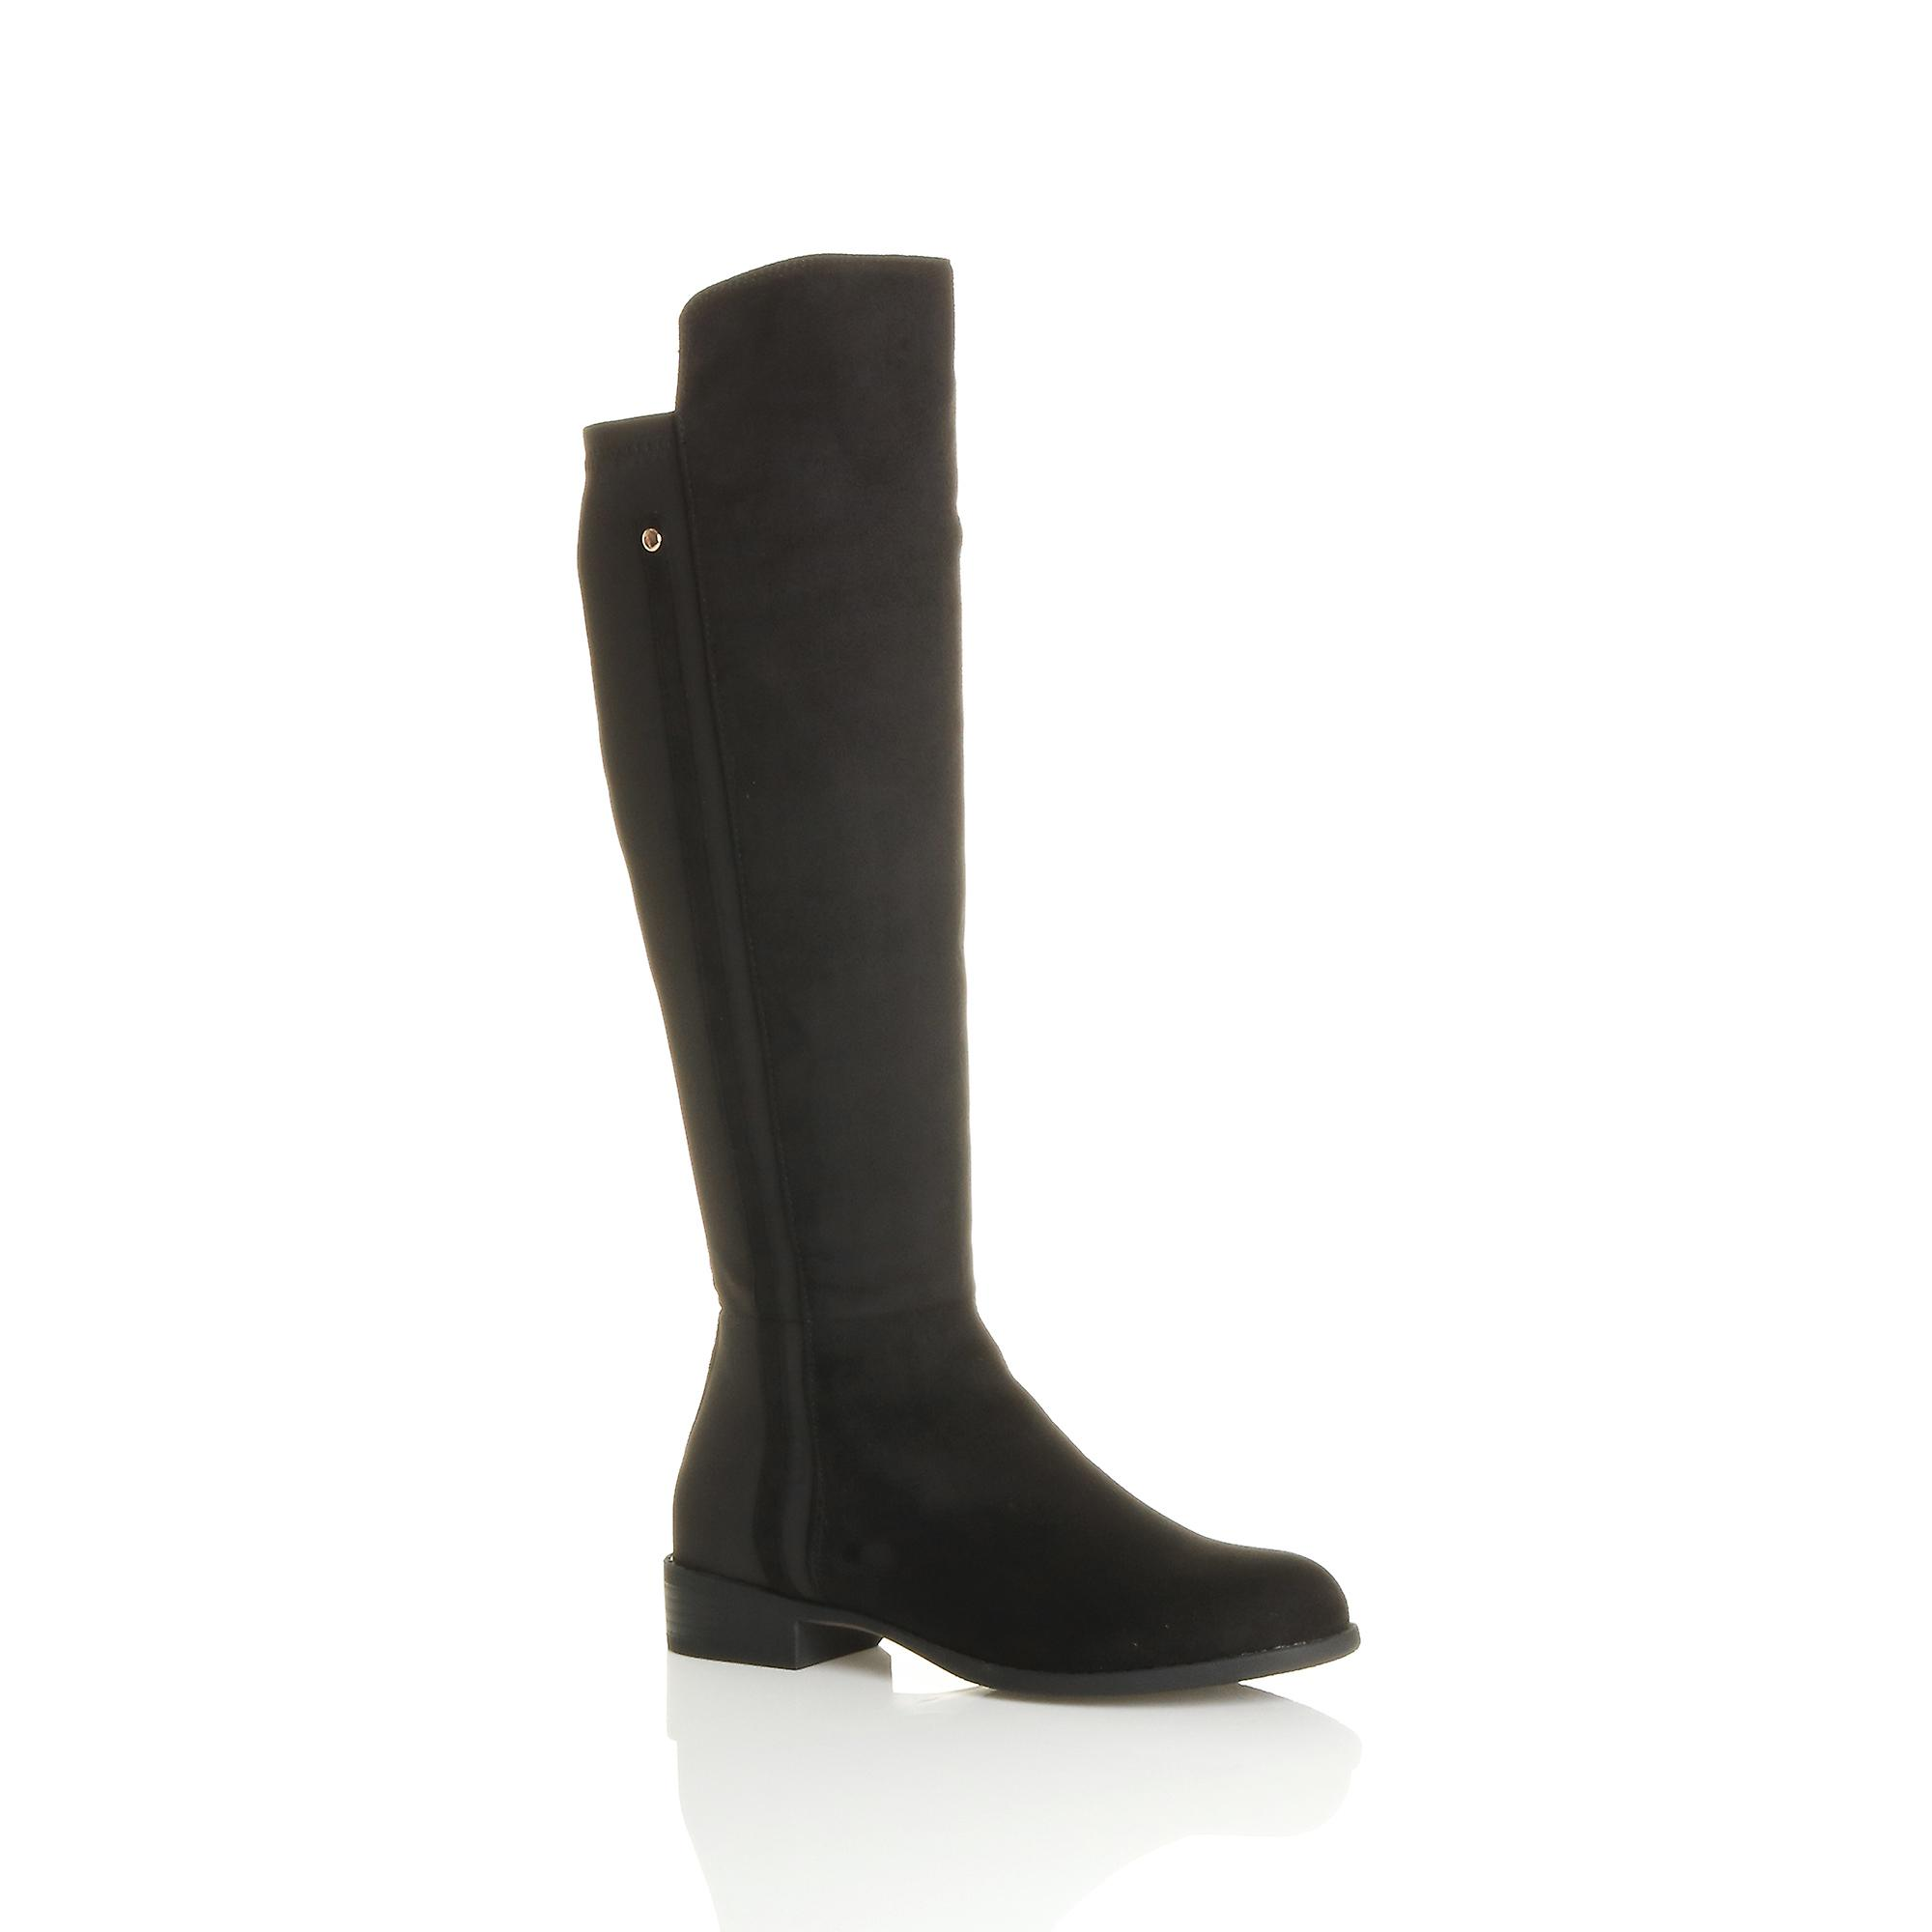 stretch riding contrast low Ajvani calf womens zip boots knee smart heel gZWTUWq